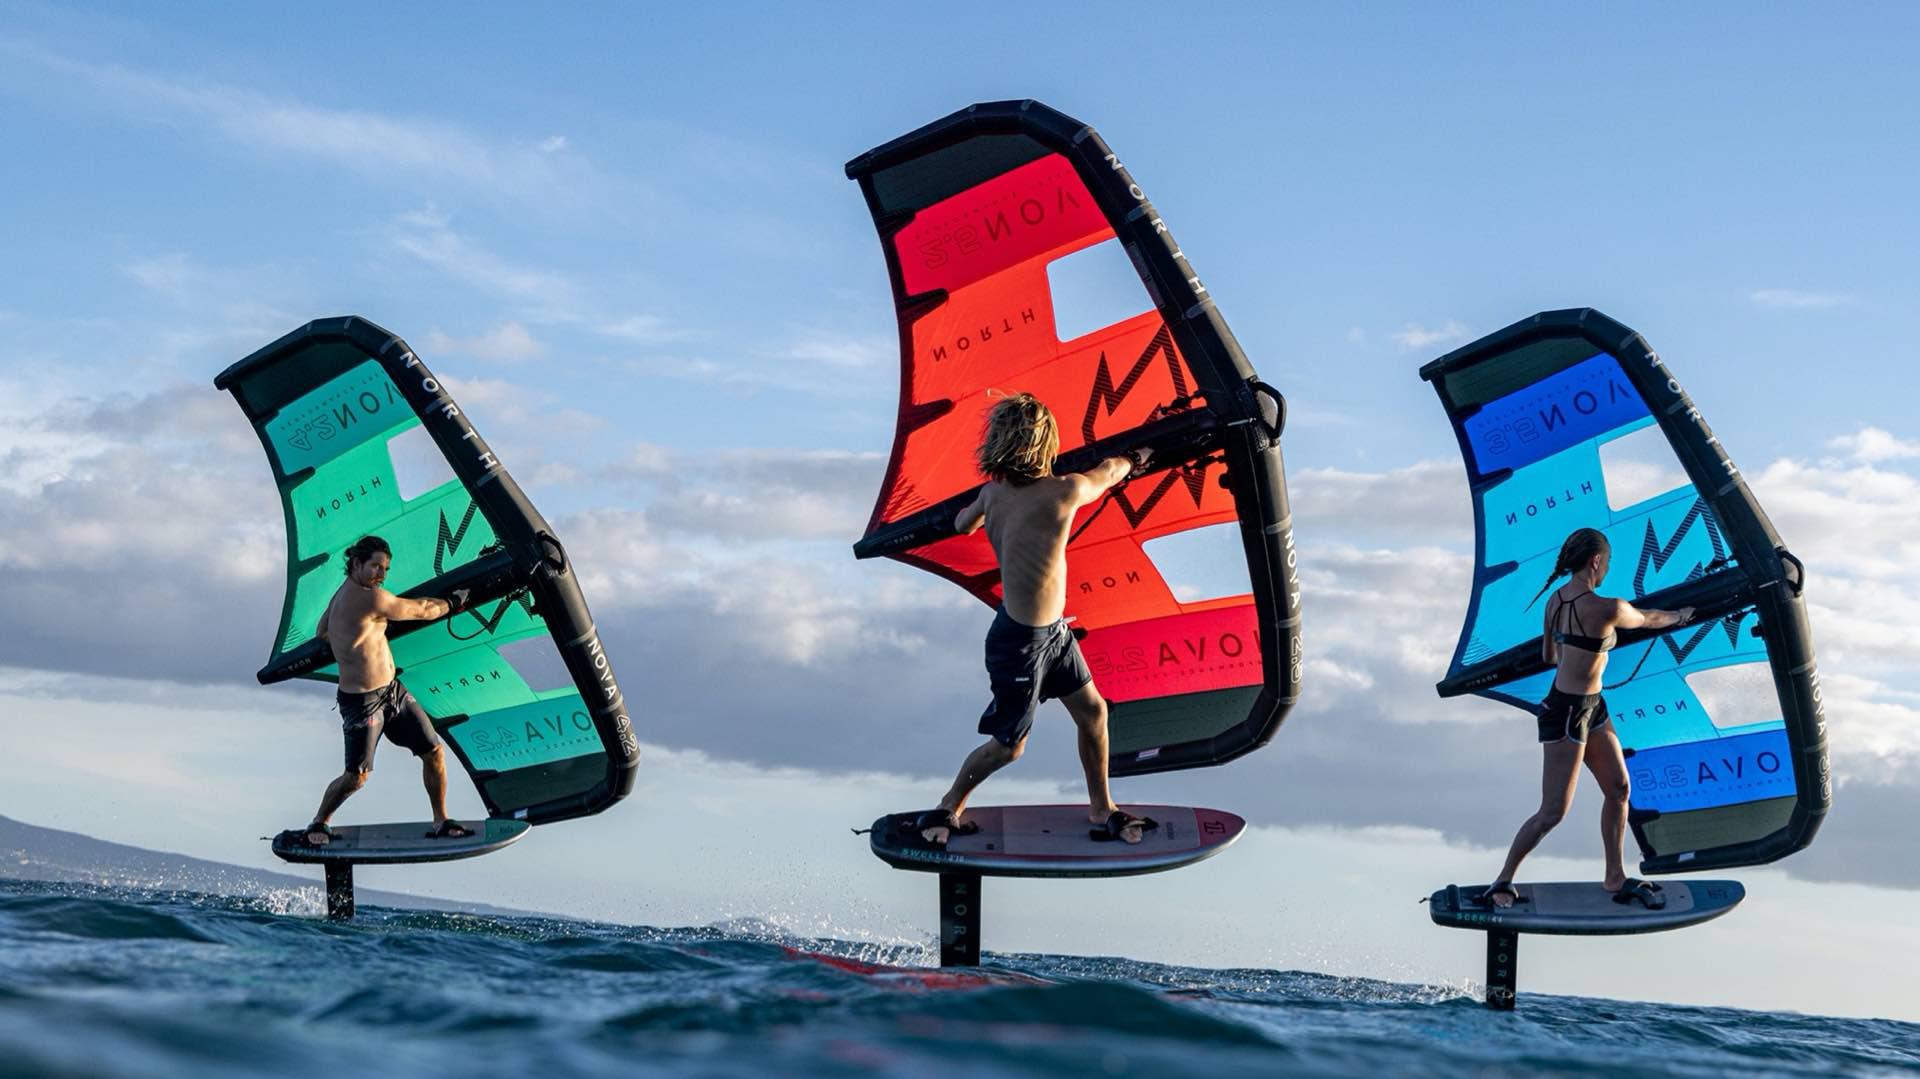 Kite Camp Caraibi in Catamarano